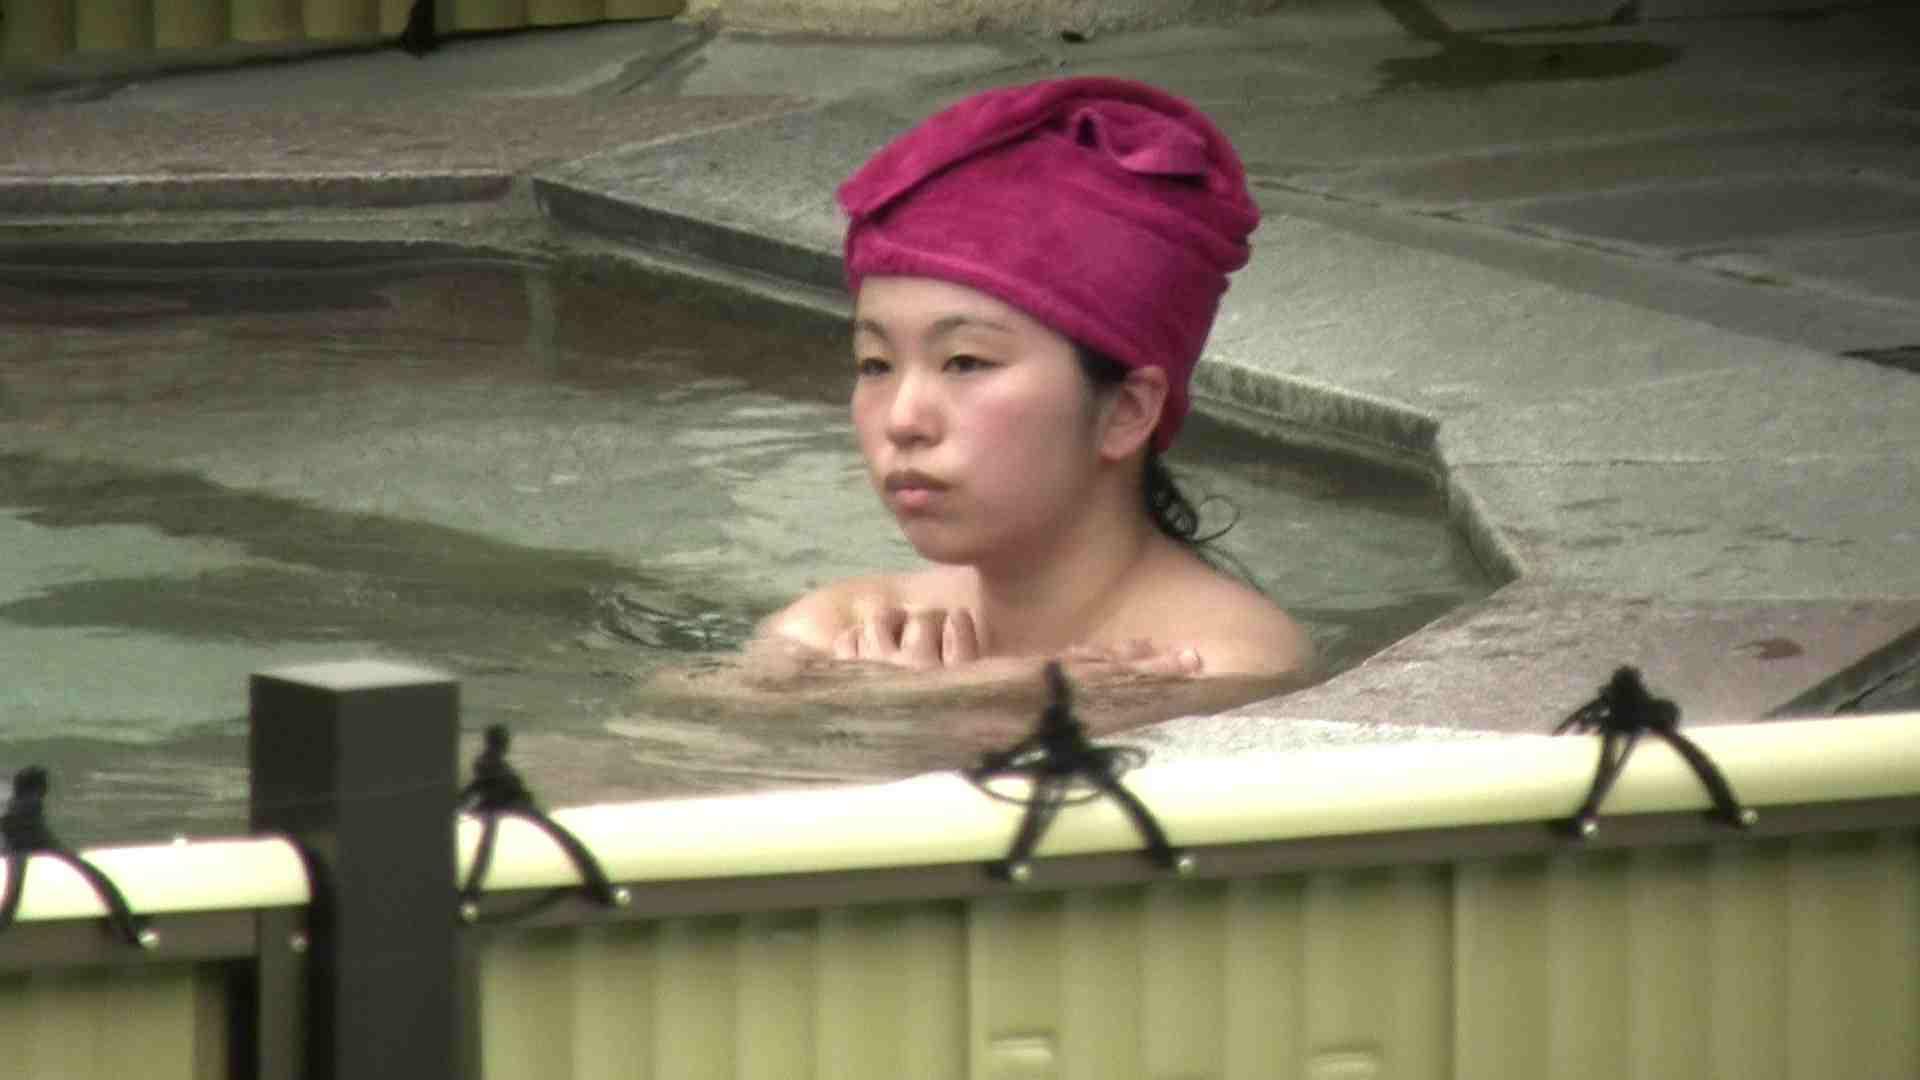 Aquaな露天風呂Vol.186 盗撮 | HなOL  78pic 8